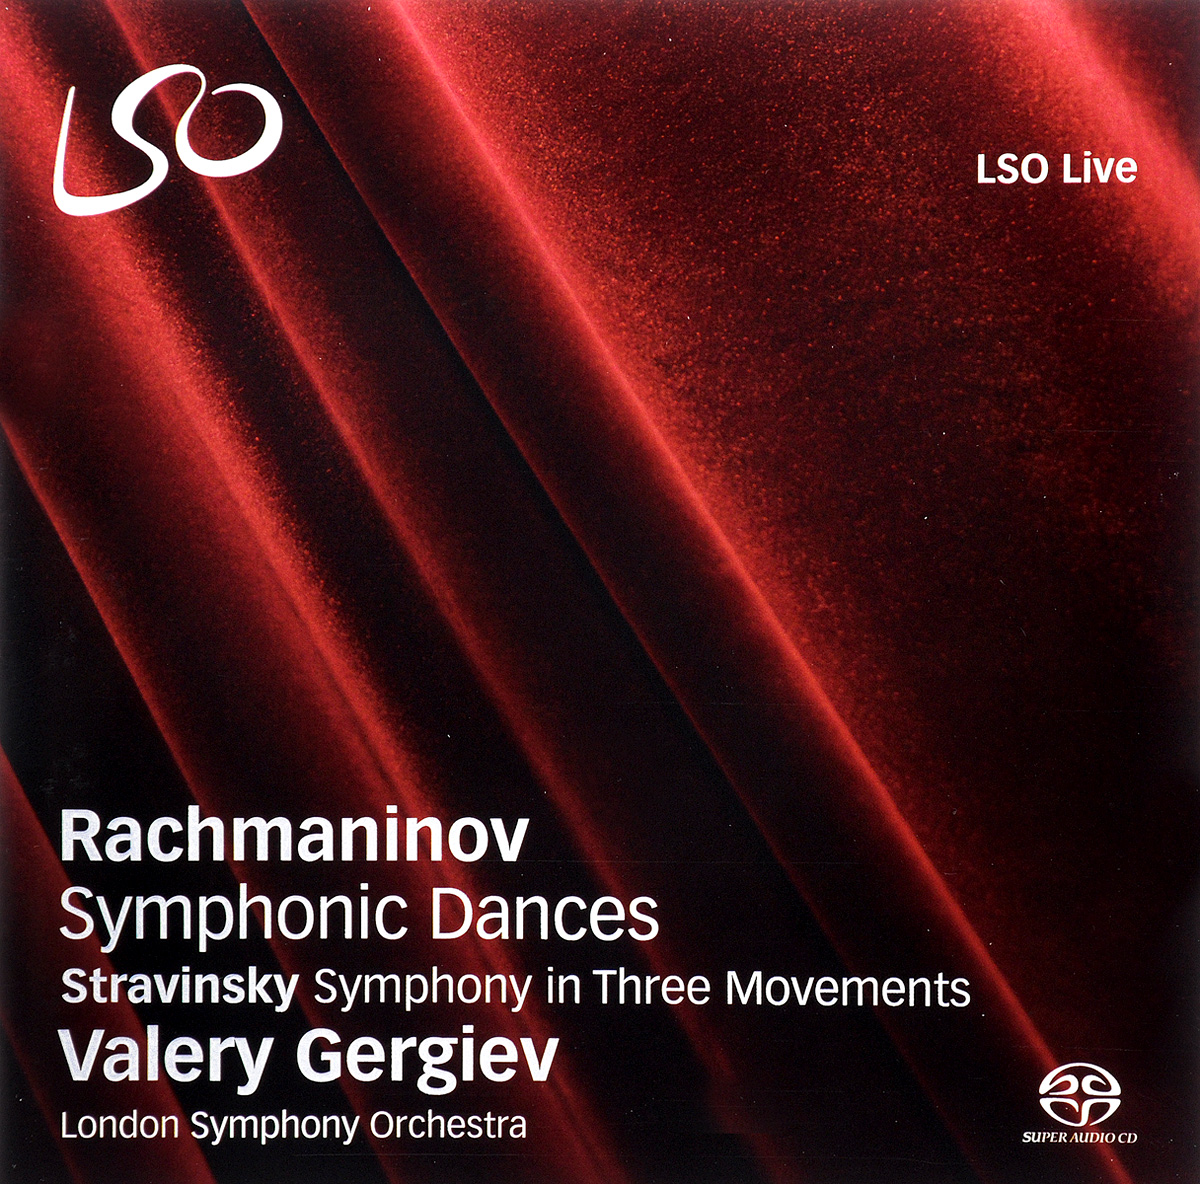 Valery Gergiev. Rachmaninov. Symphonic Dances / Strawinsky. Symphony in Three Movements valery gergiev rachmaninov symphonic dances strawinsky symphony in three movements